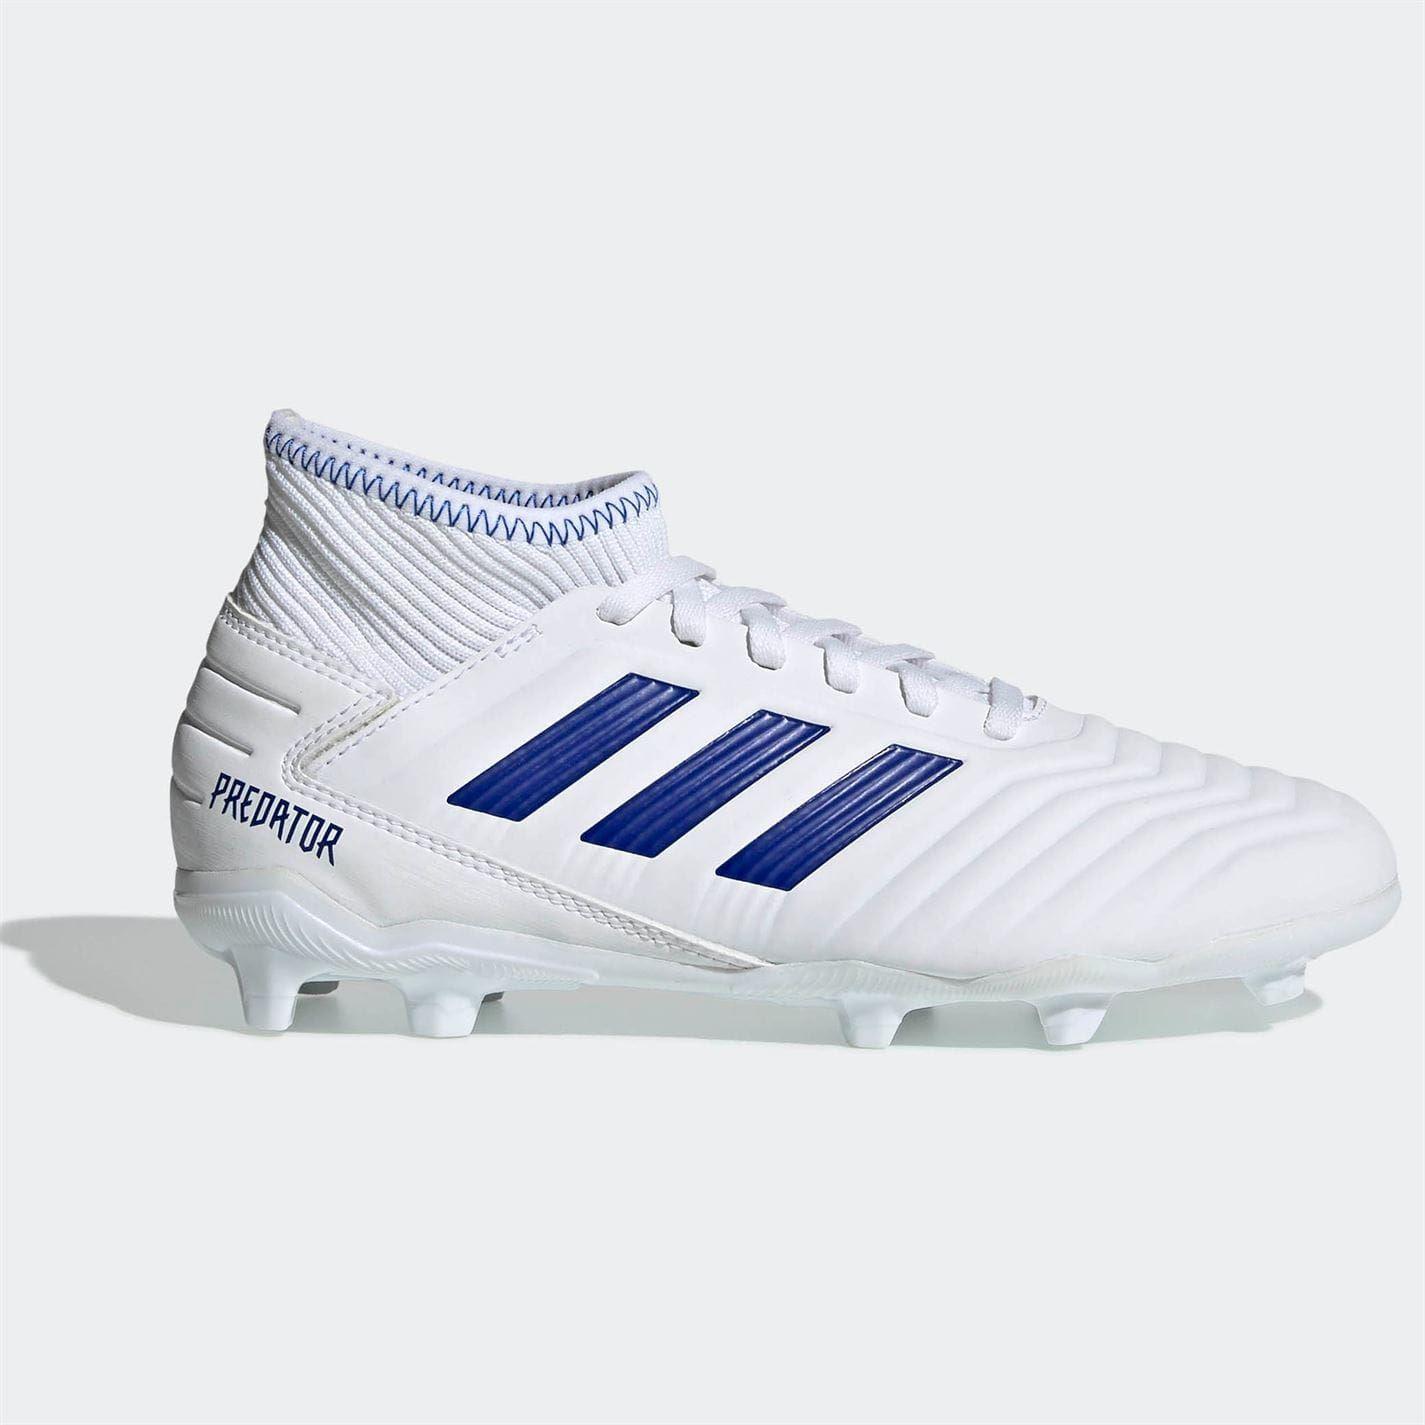 Details about adidas Predator 19.3 s FG Football Boots Child Boys WhiteBlue